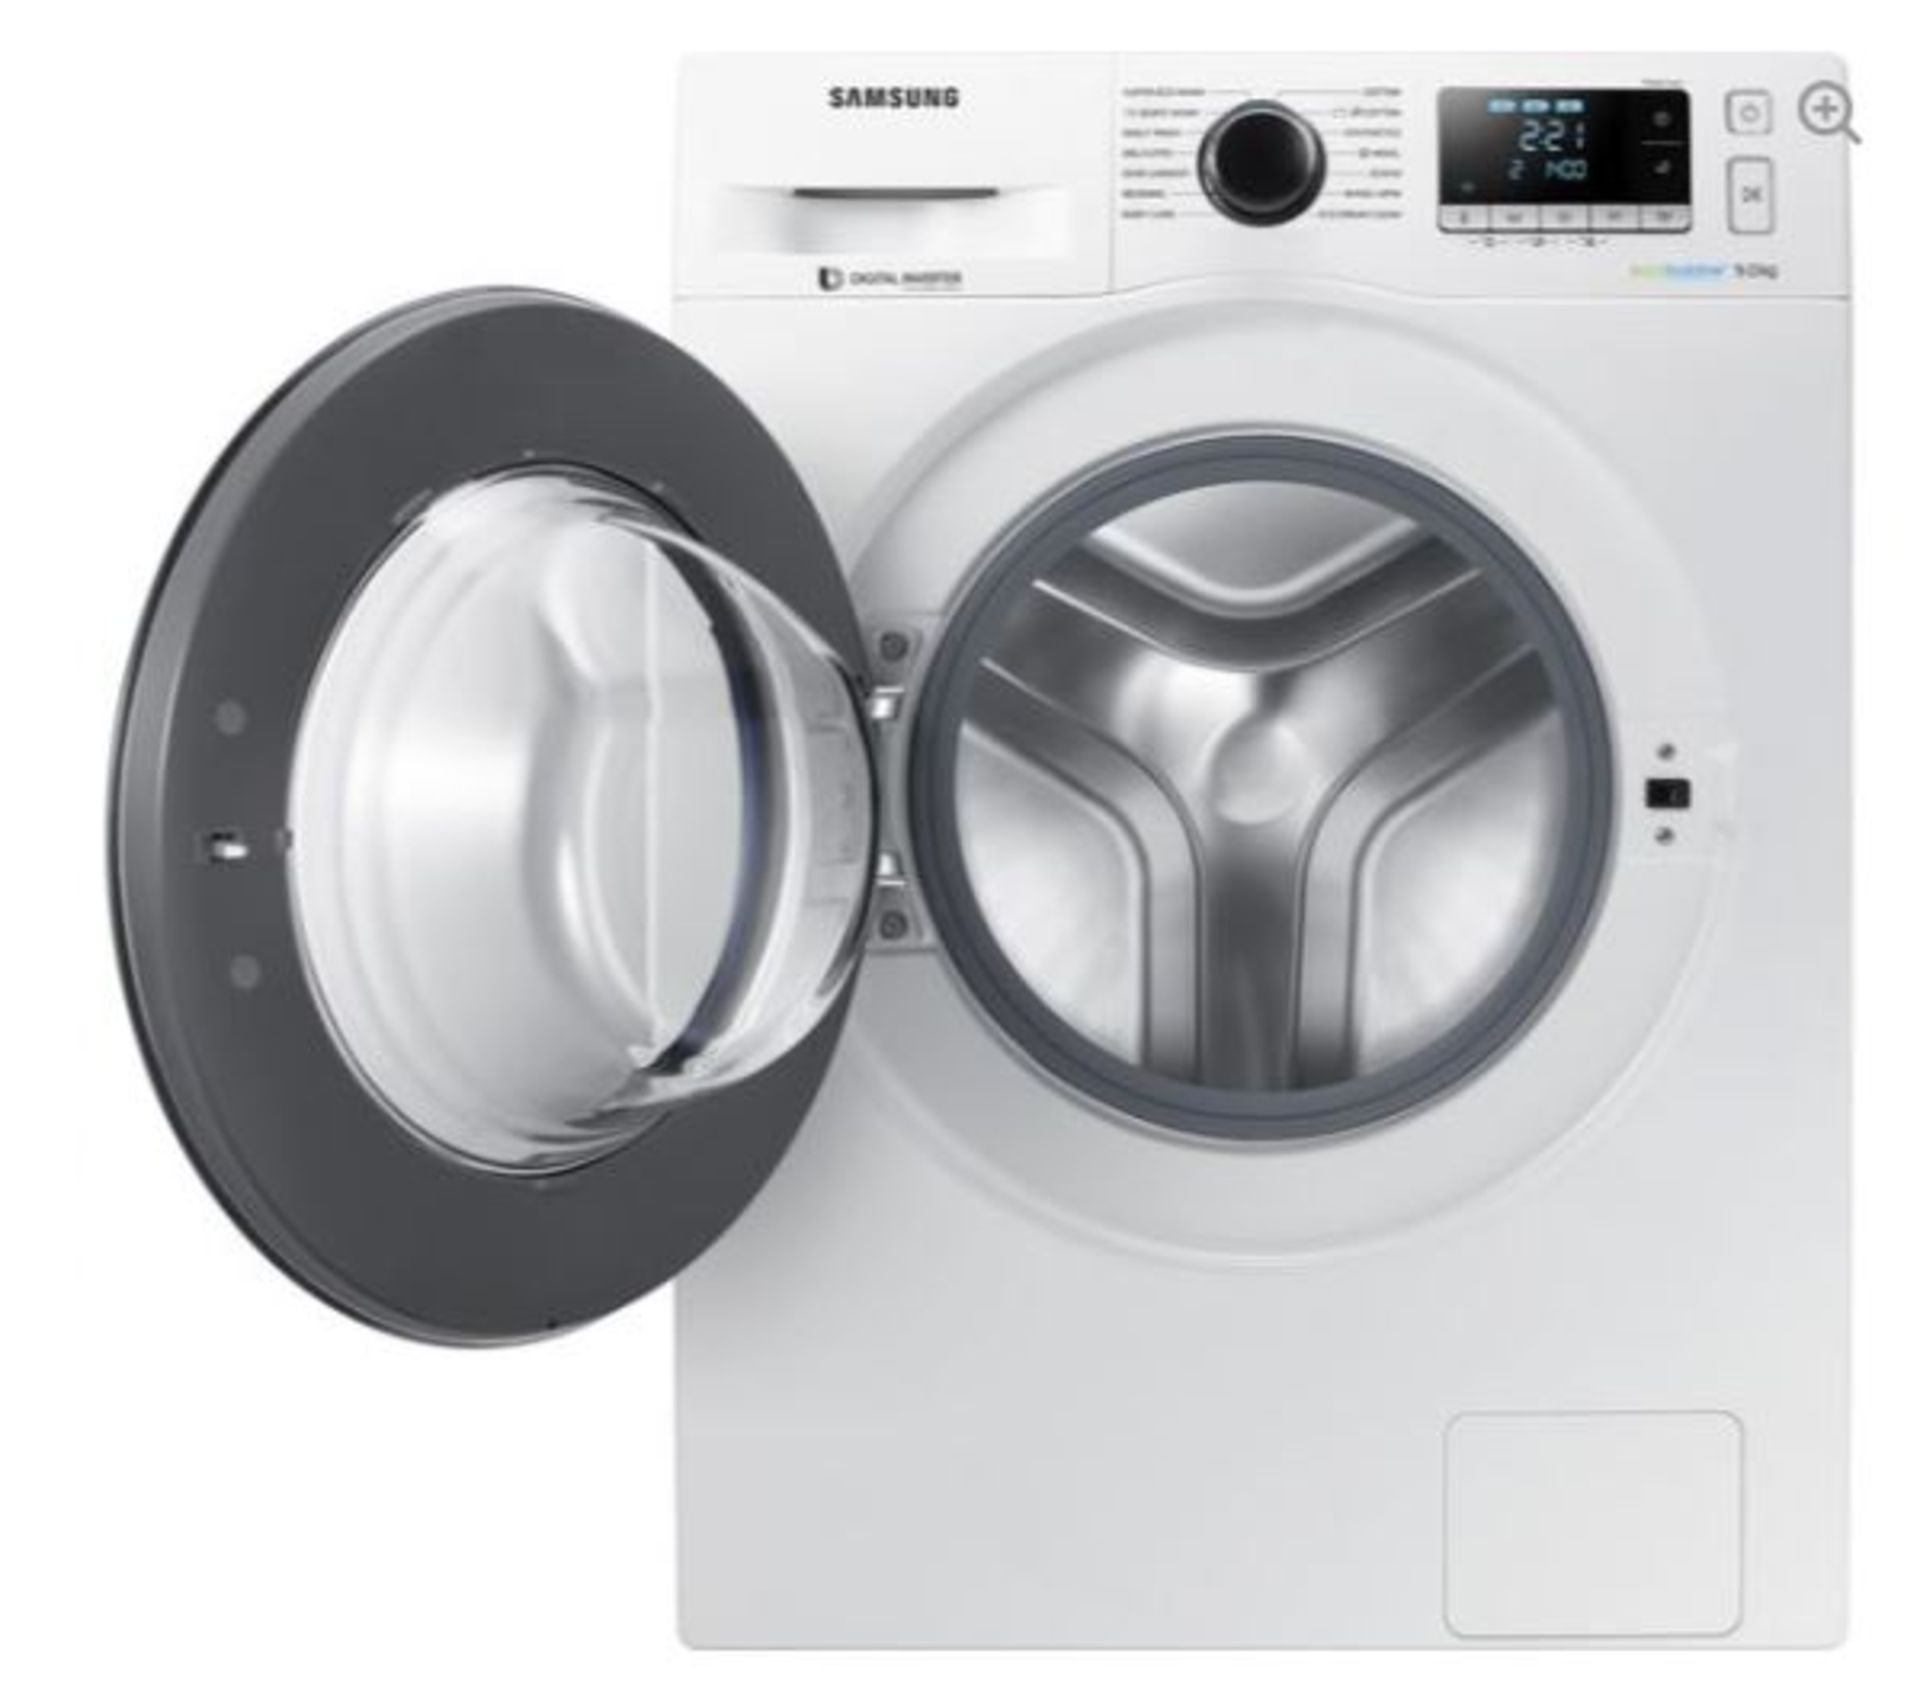 Pallet of 2 Samsung Premium Washing machines. Latest selling price £738 - Image 4 of 8